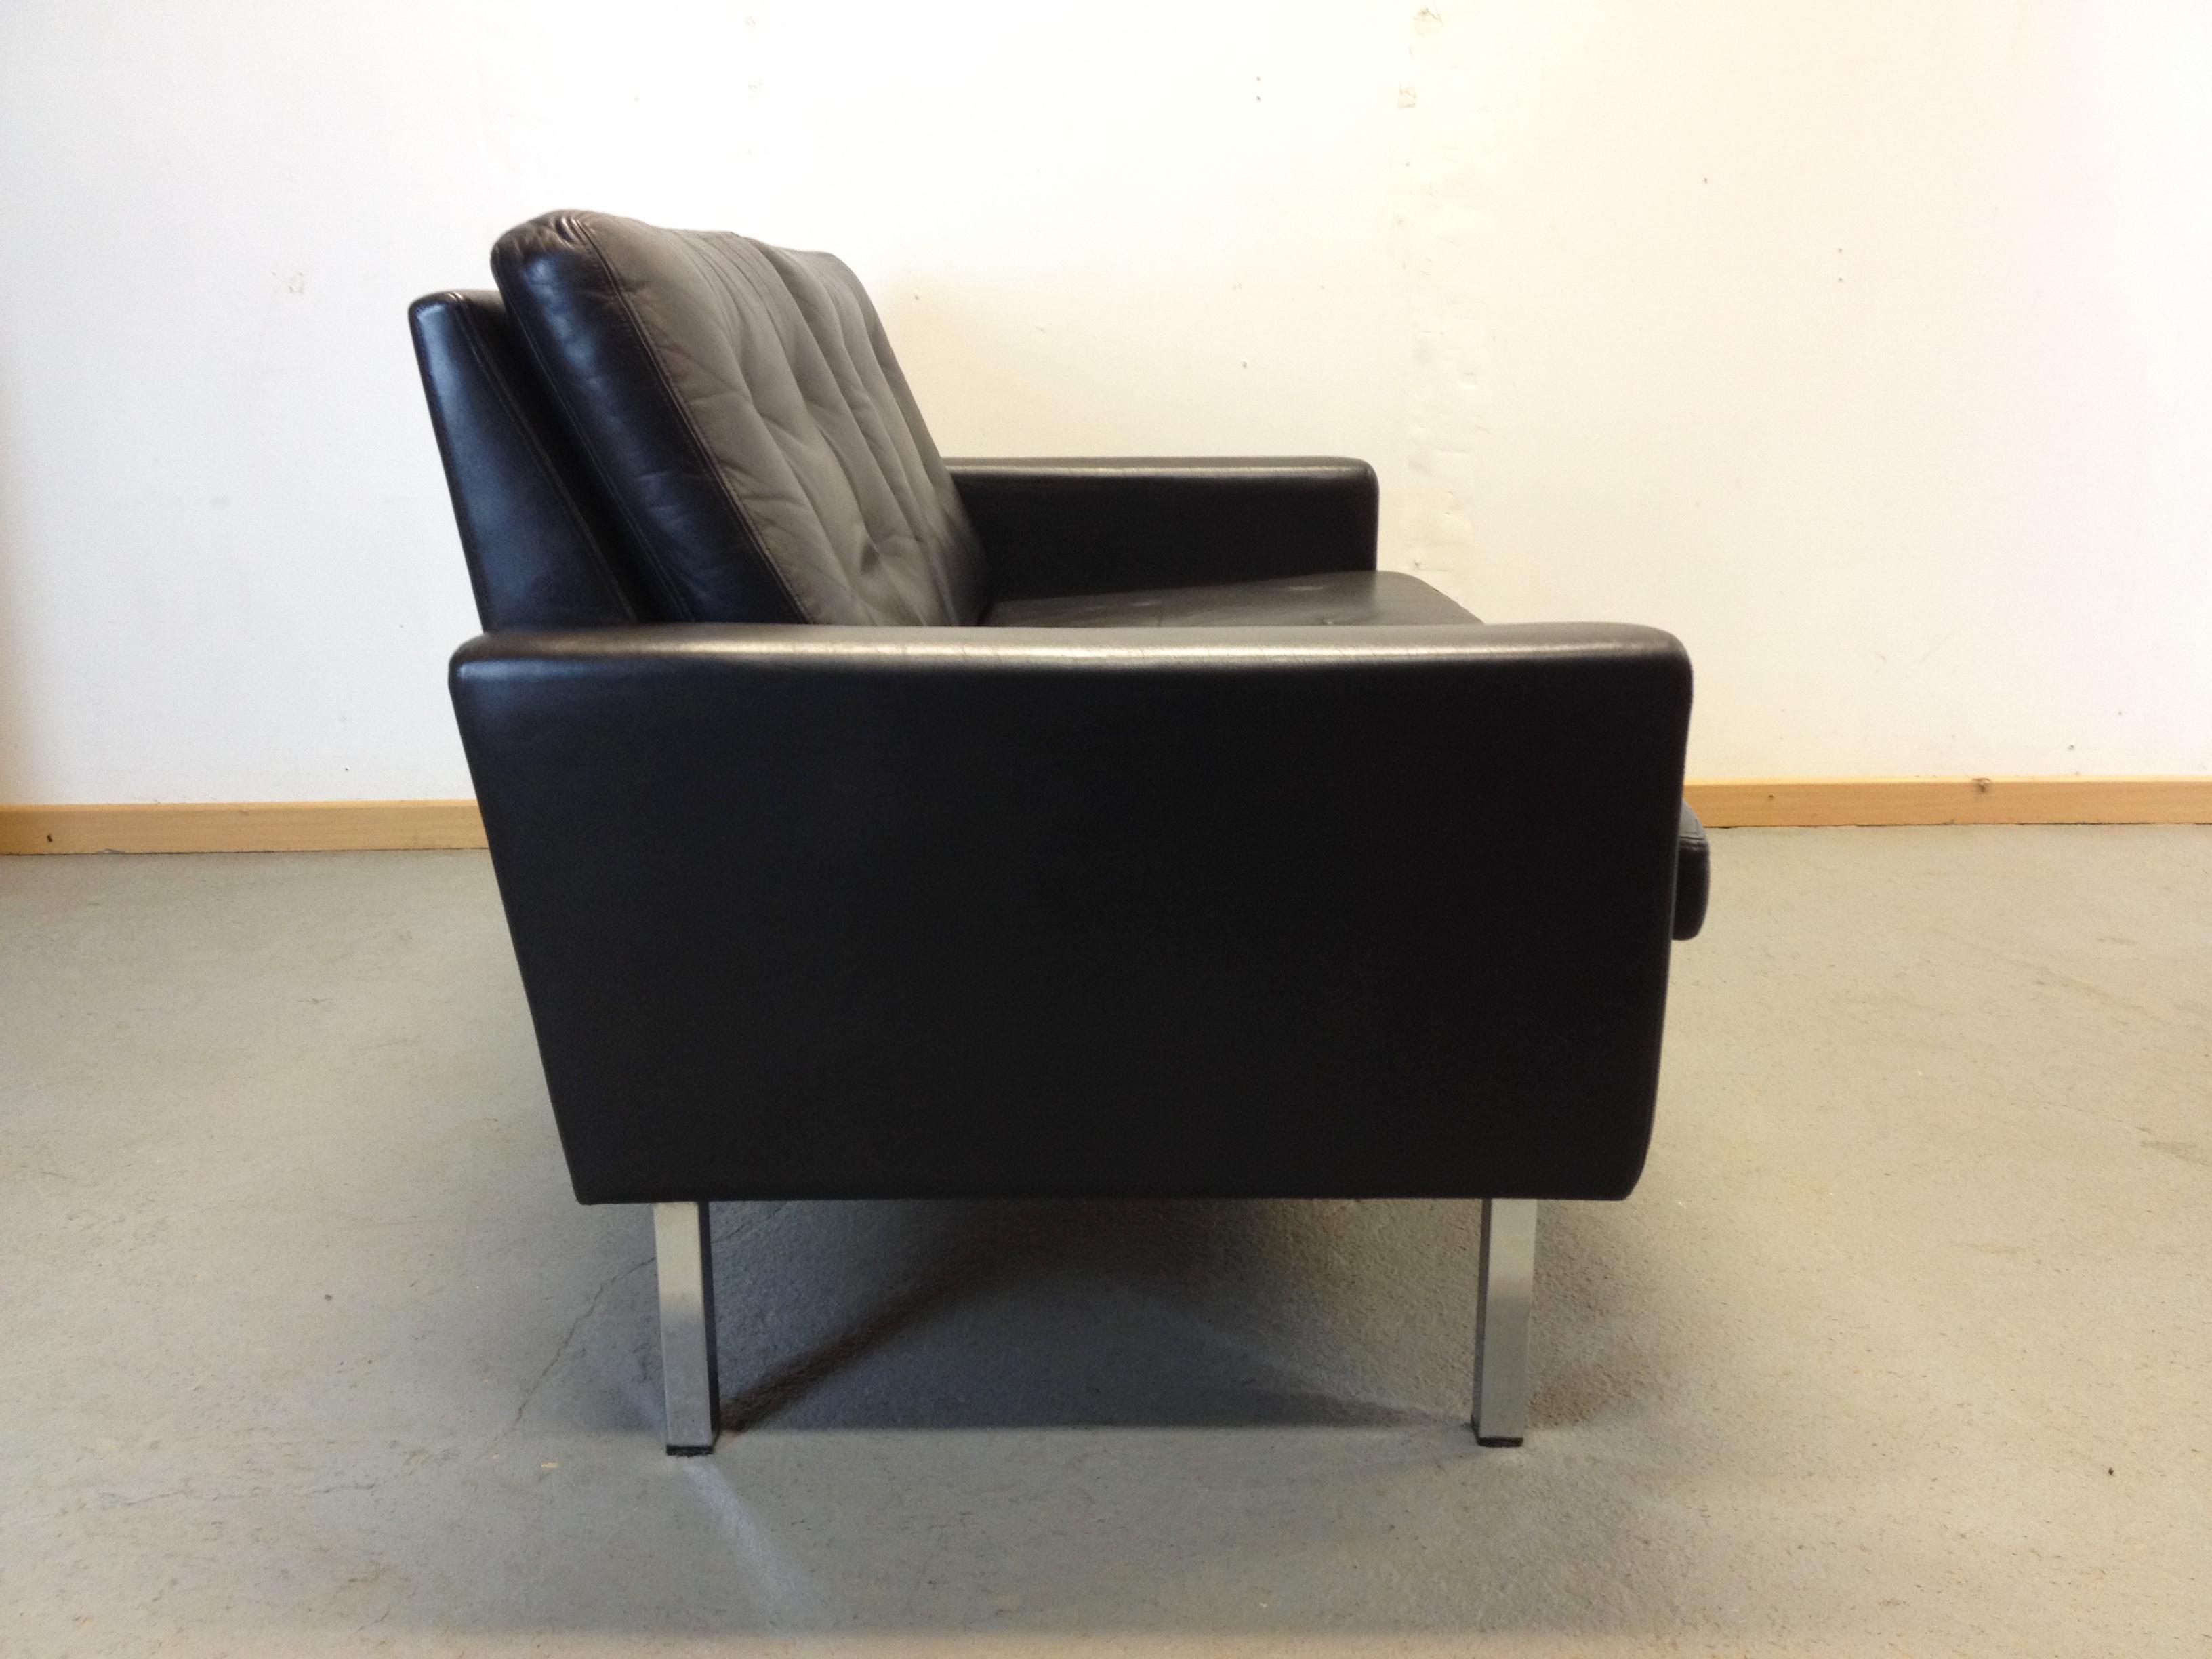 canap banquette cuir 2 places ann e 60. Black Bedroom Furniture Sets. Home Design Ideas